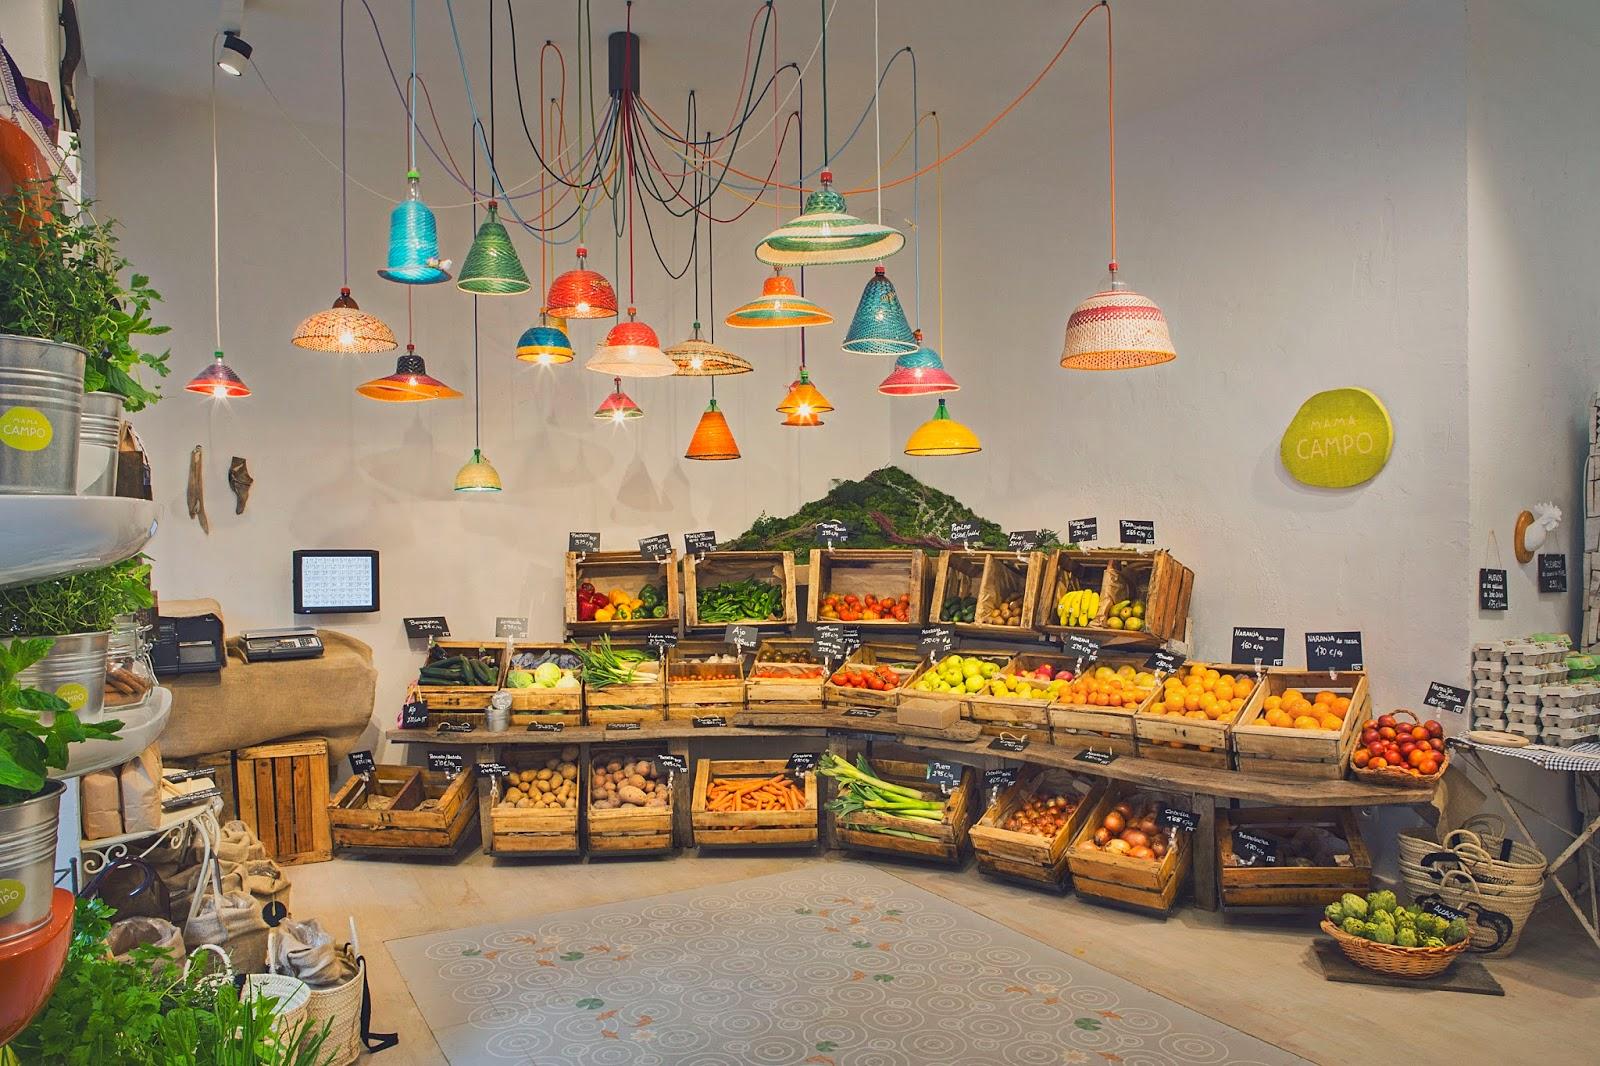 Mama Campo groceries shop